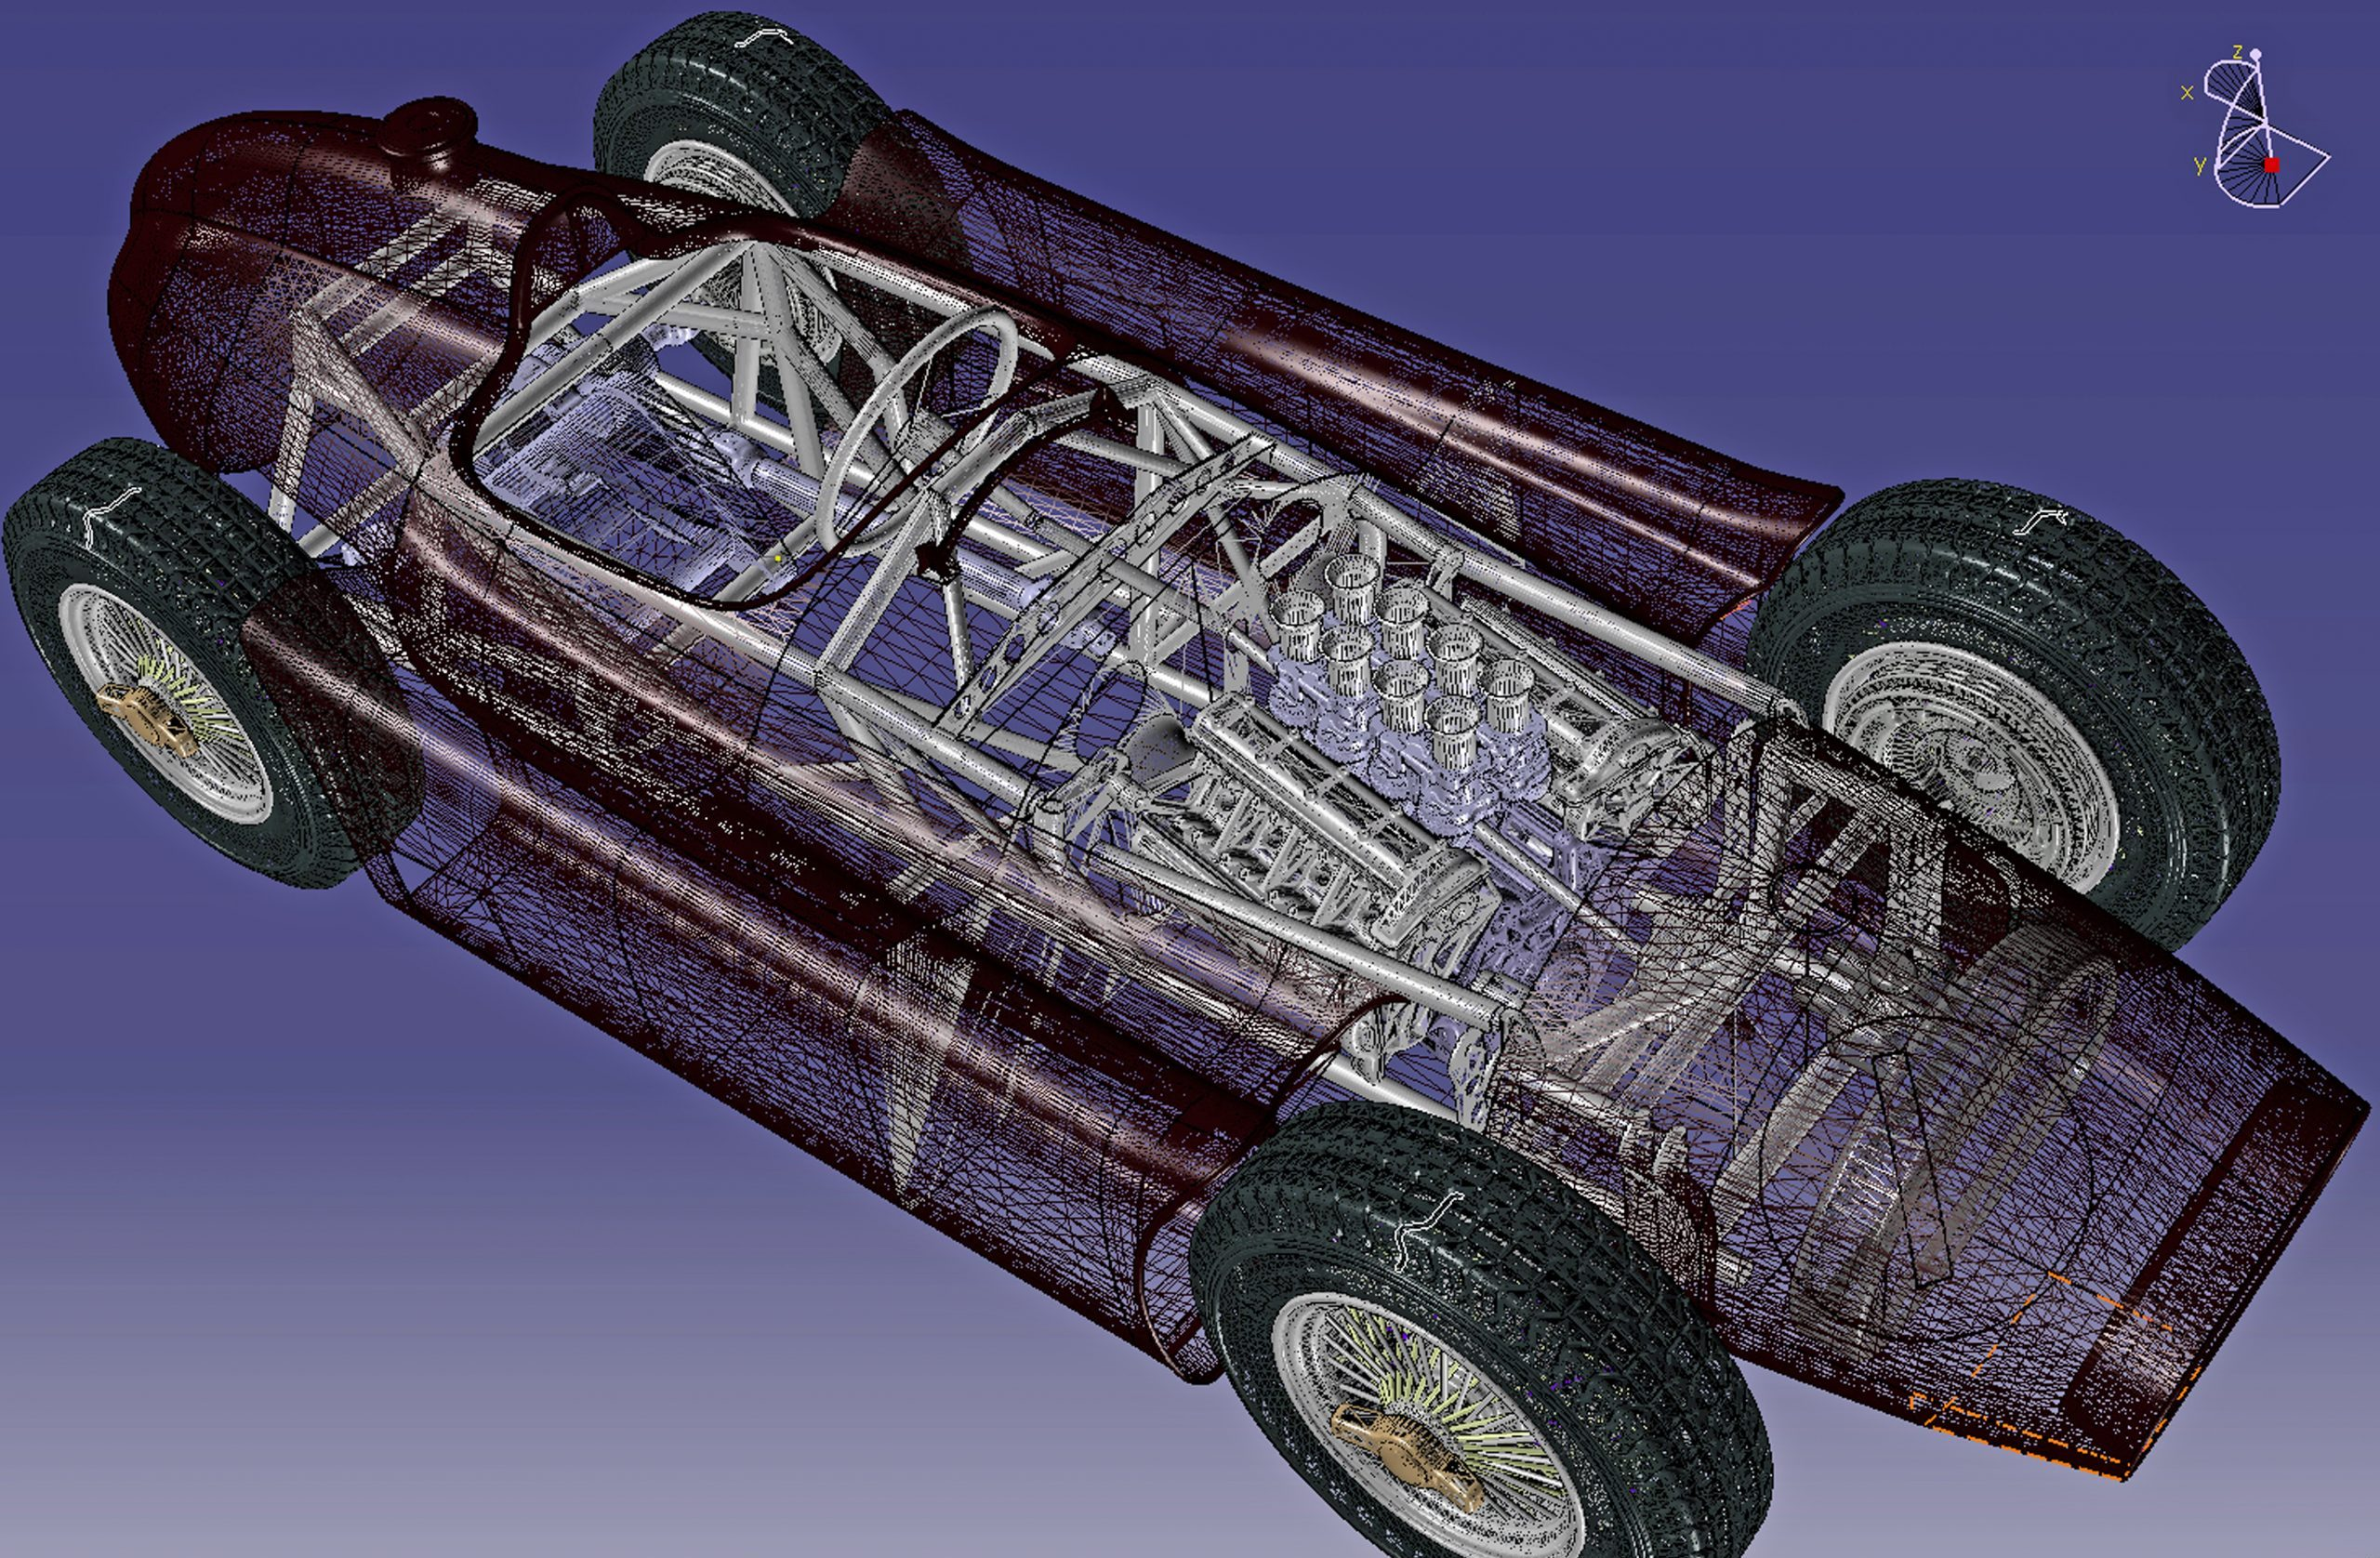 ferrari scale model chassis rendering